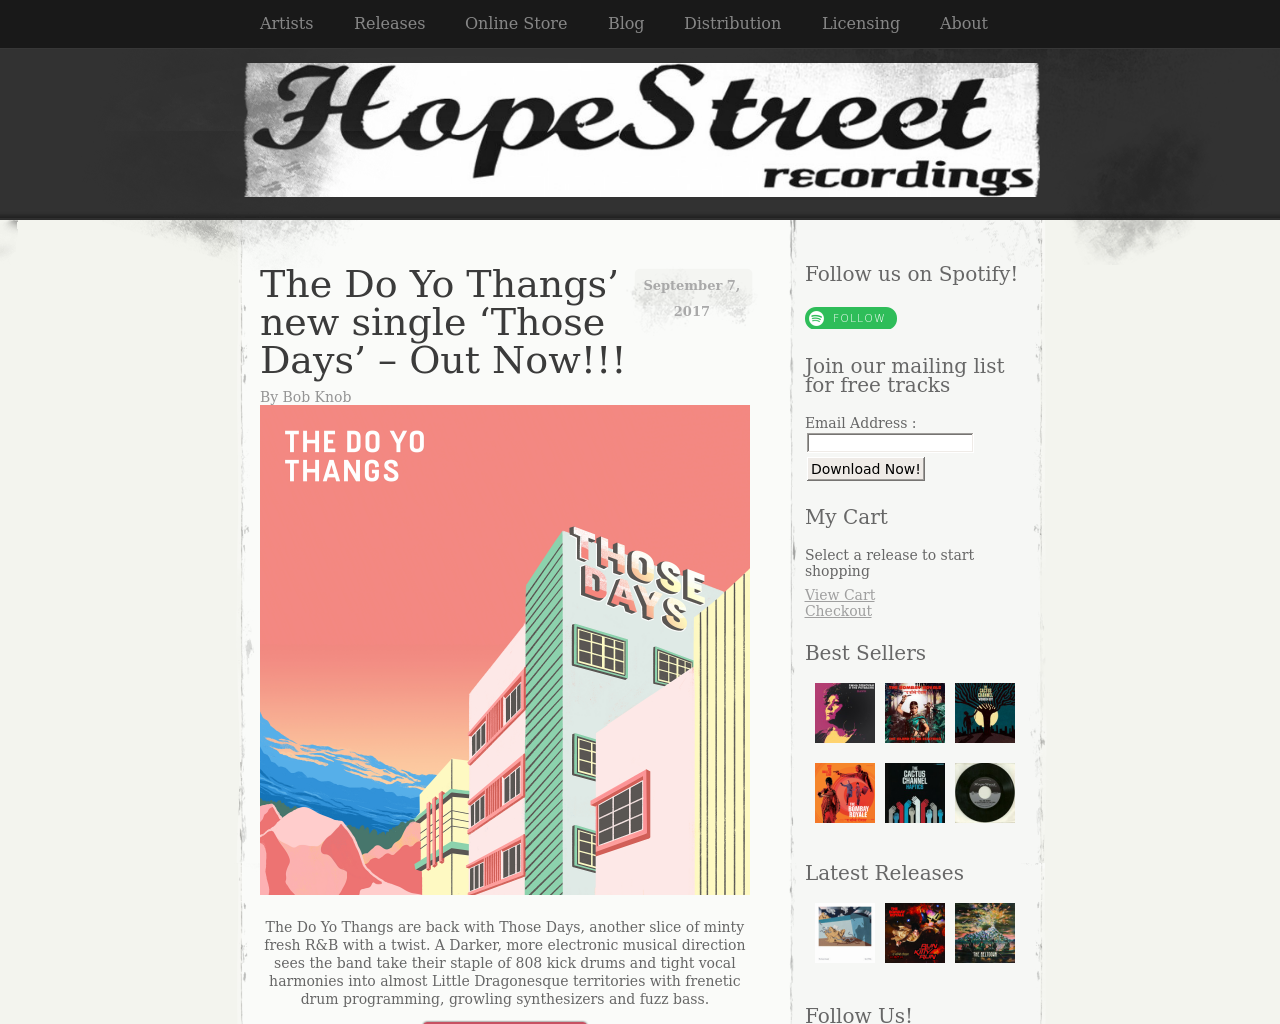 HopeStreet-Recordings-Advertising-Reviews-Pricing